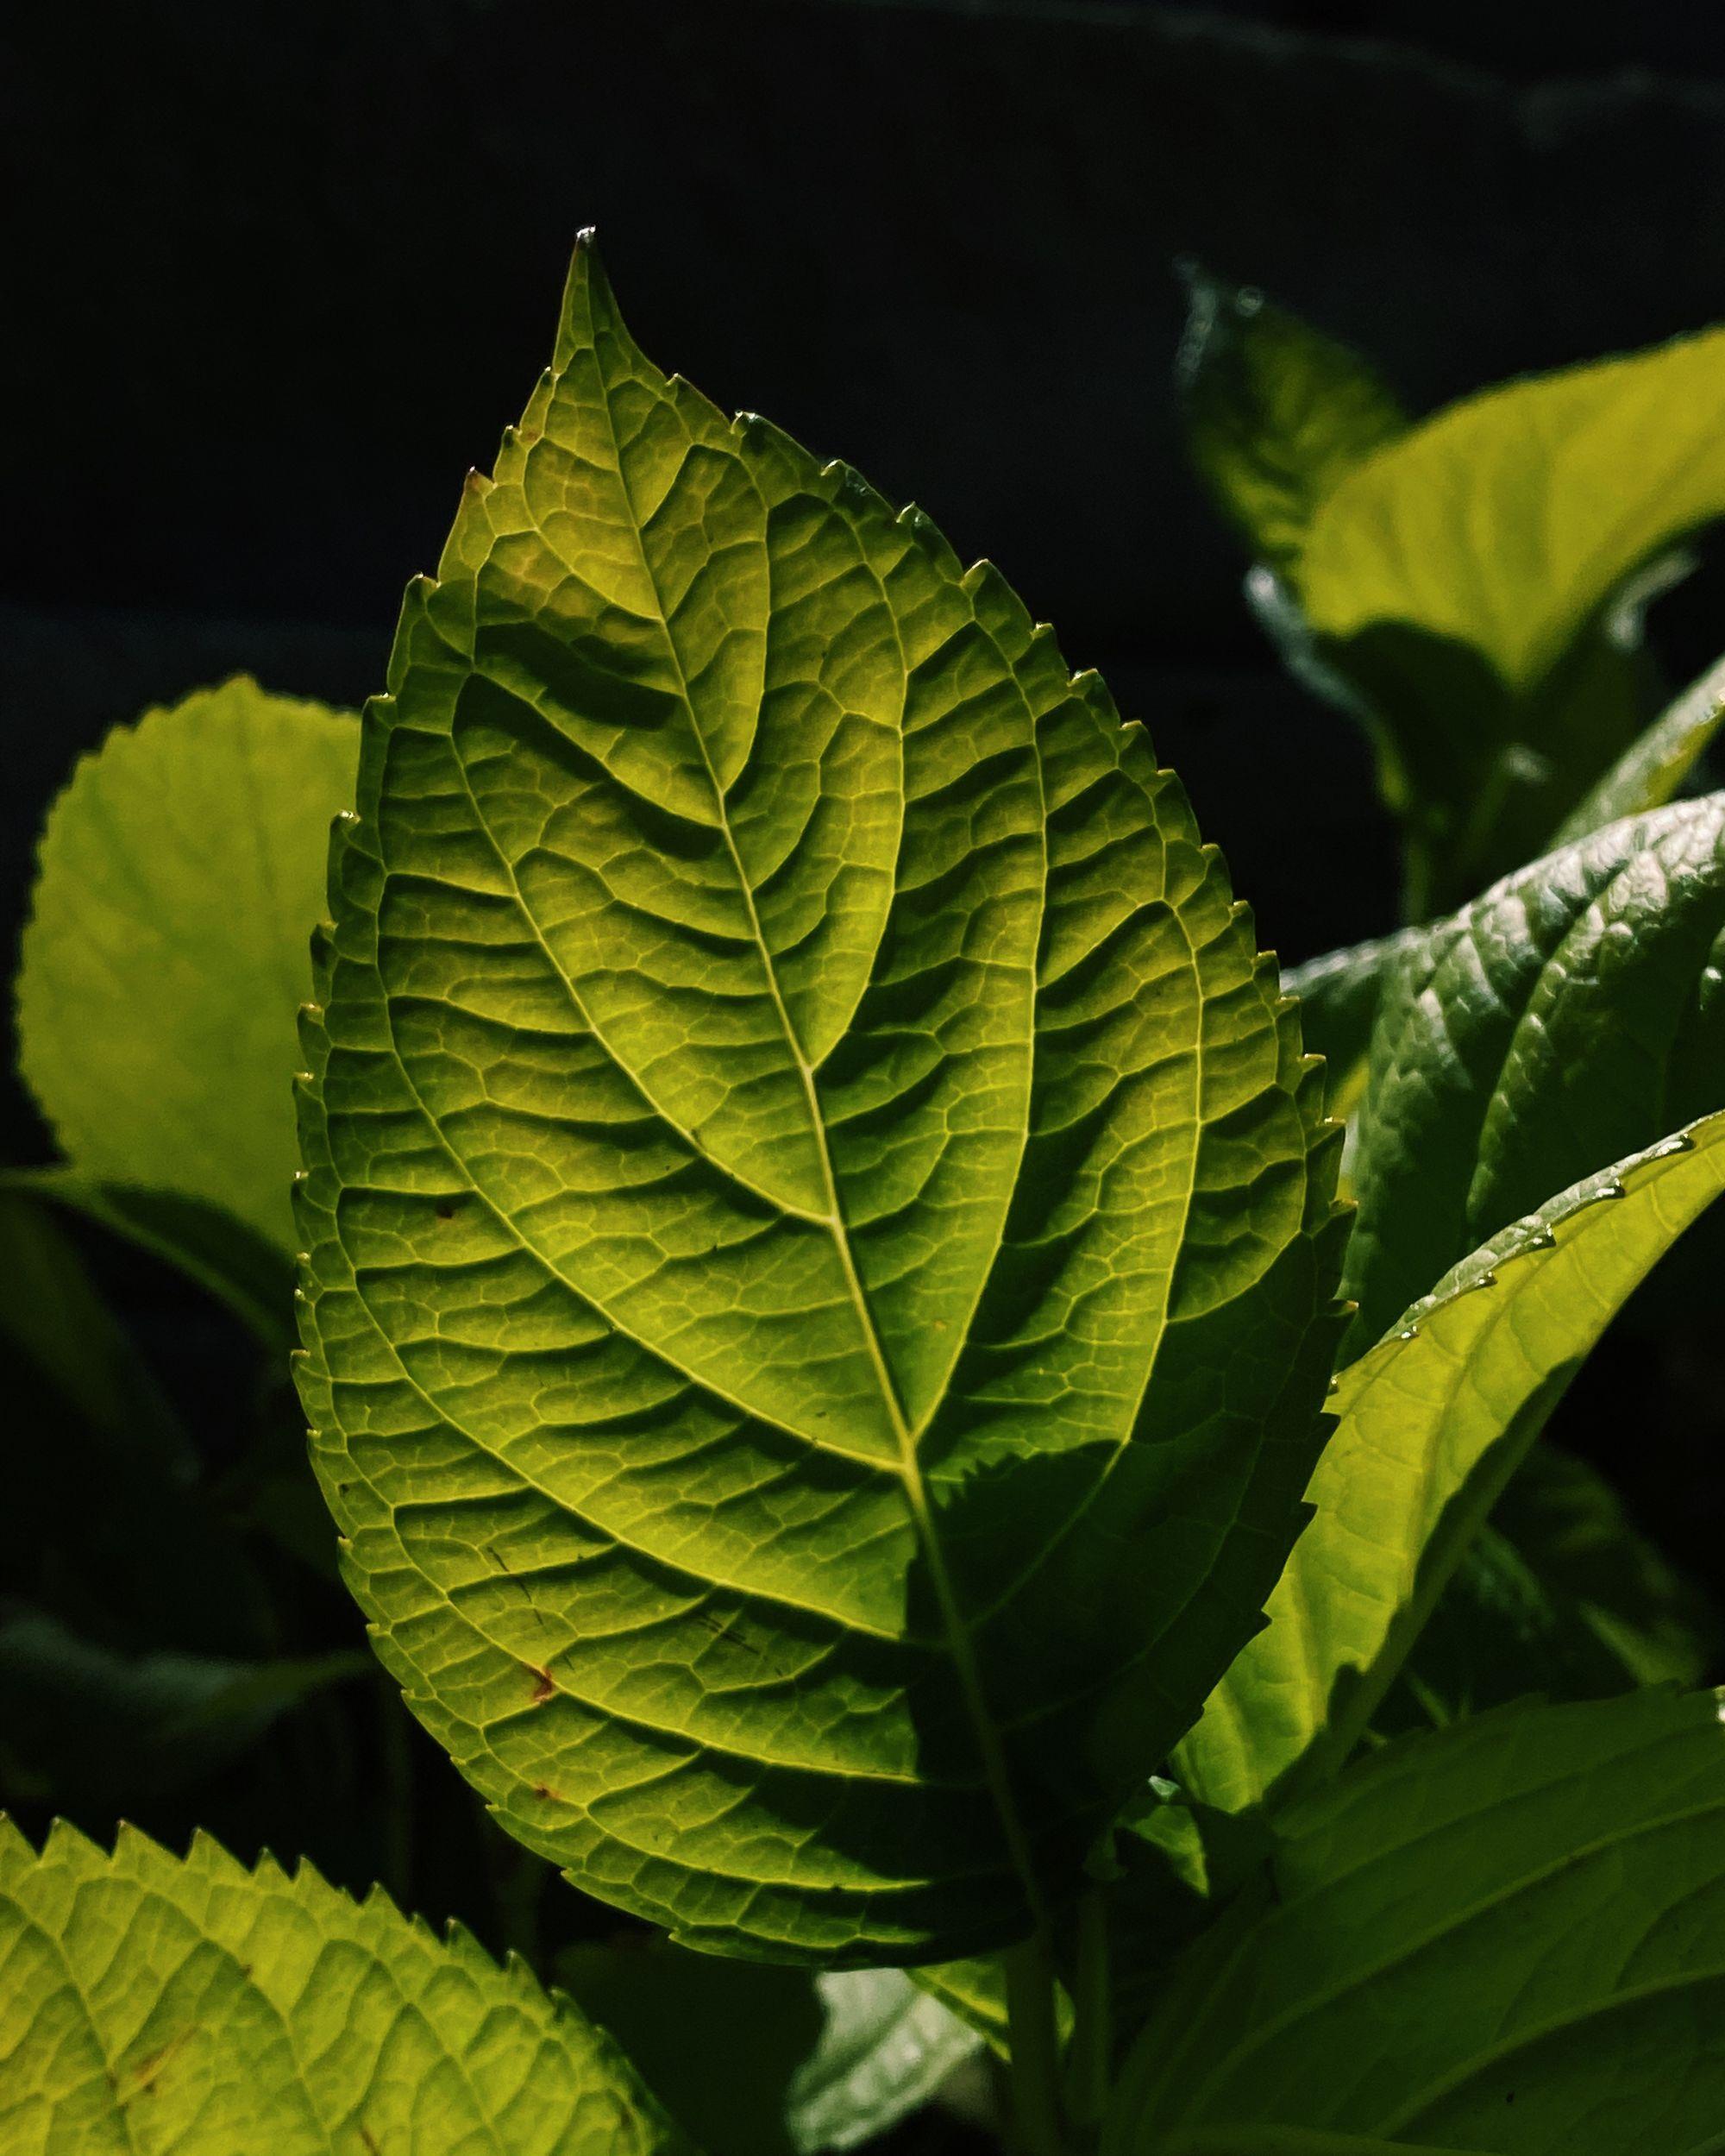 A green hydrangea leaf in deep shadow, backlit and glowing.